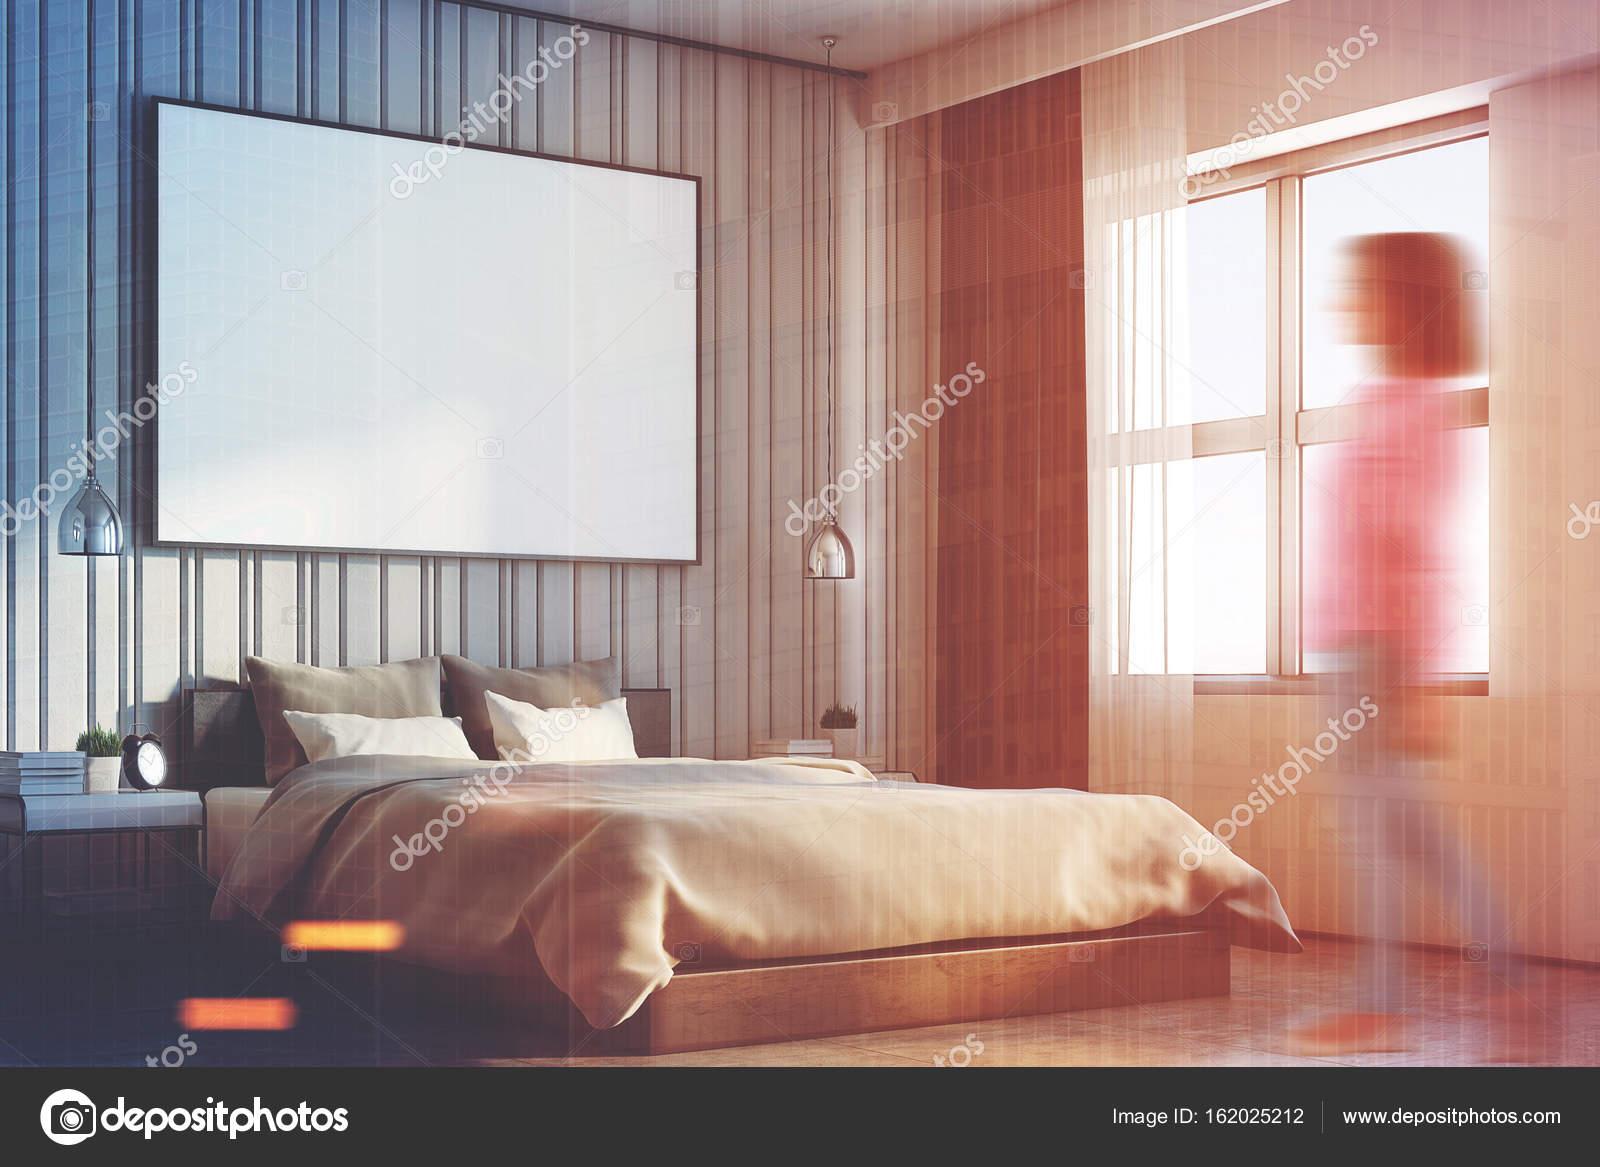 Grote Posters Slaapkamer : Beige slaapkamer met een grote poster kant meisje u stockfoto